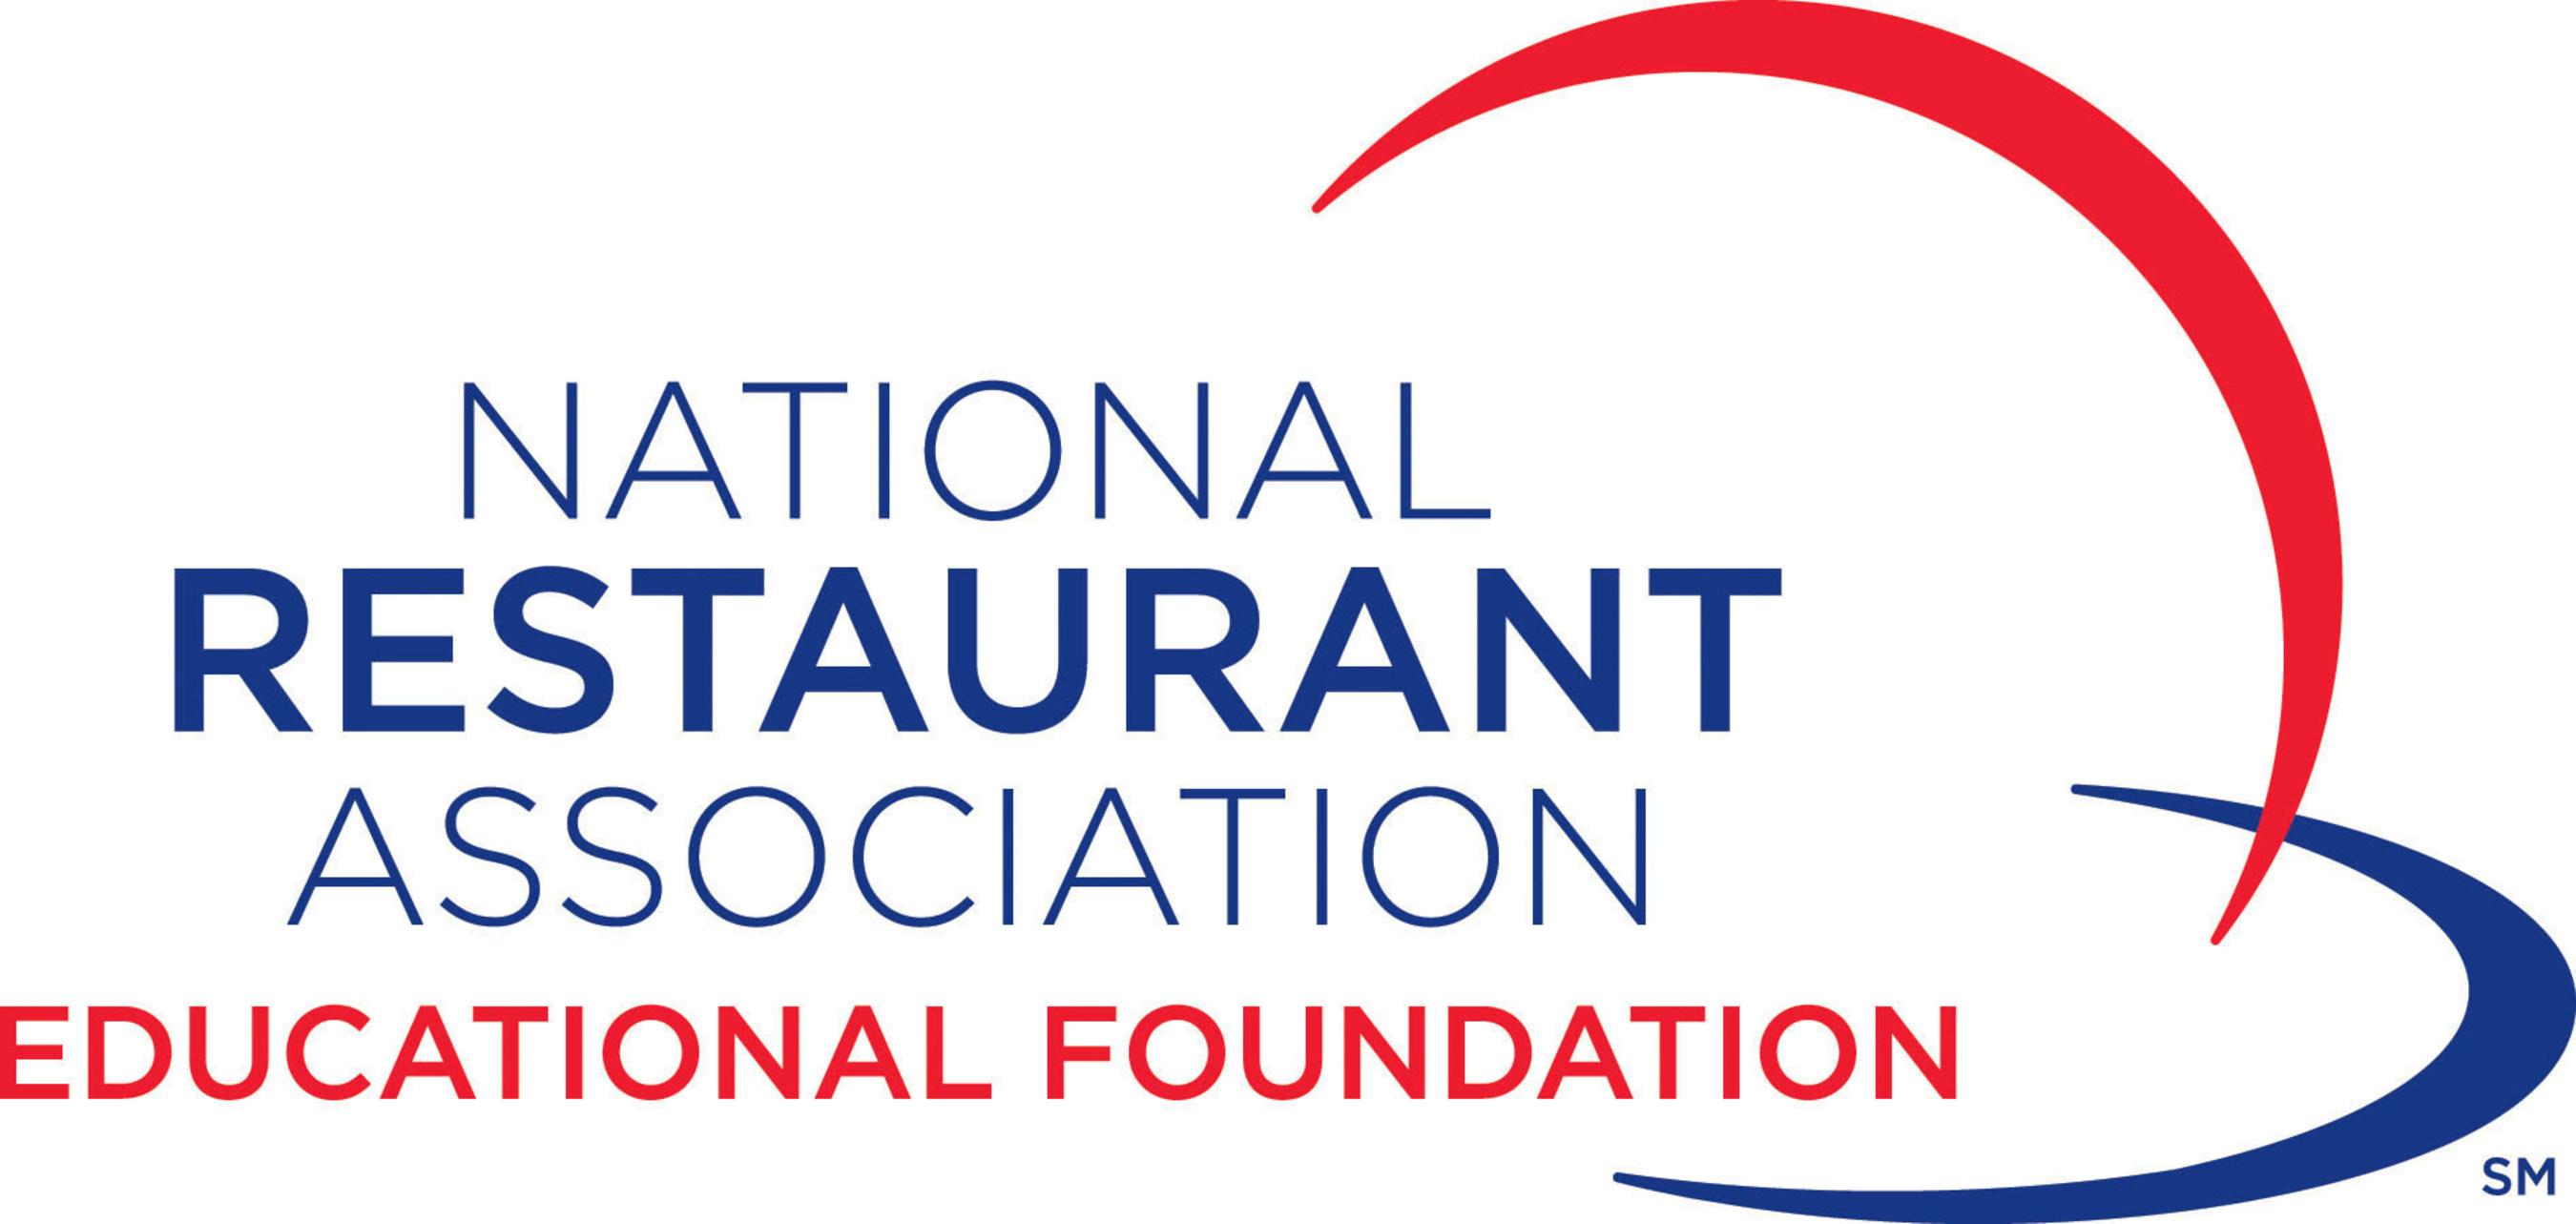 National Restaurant Association Educational Foundation Logo